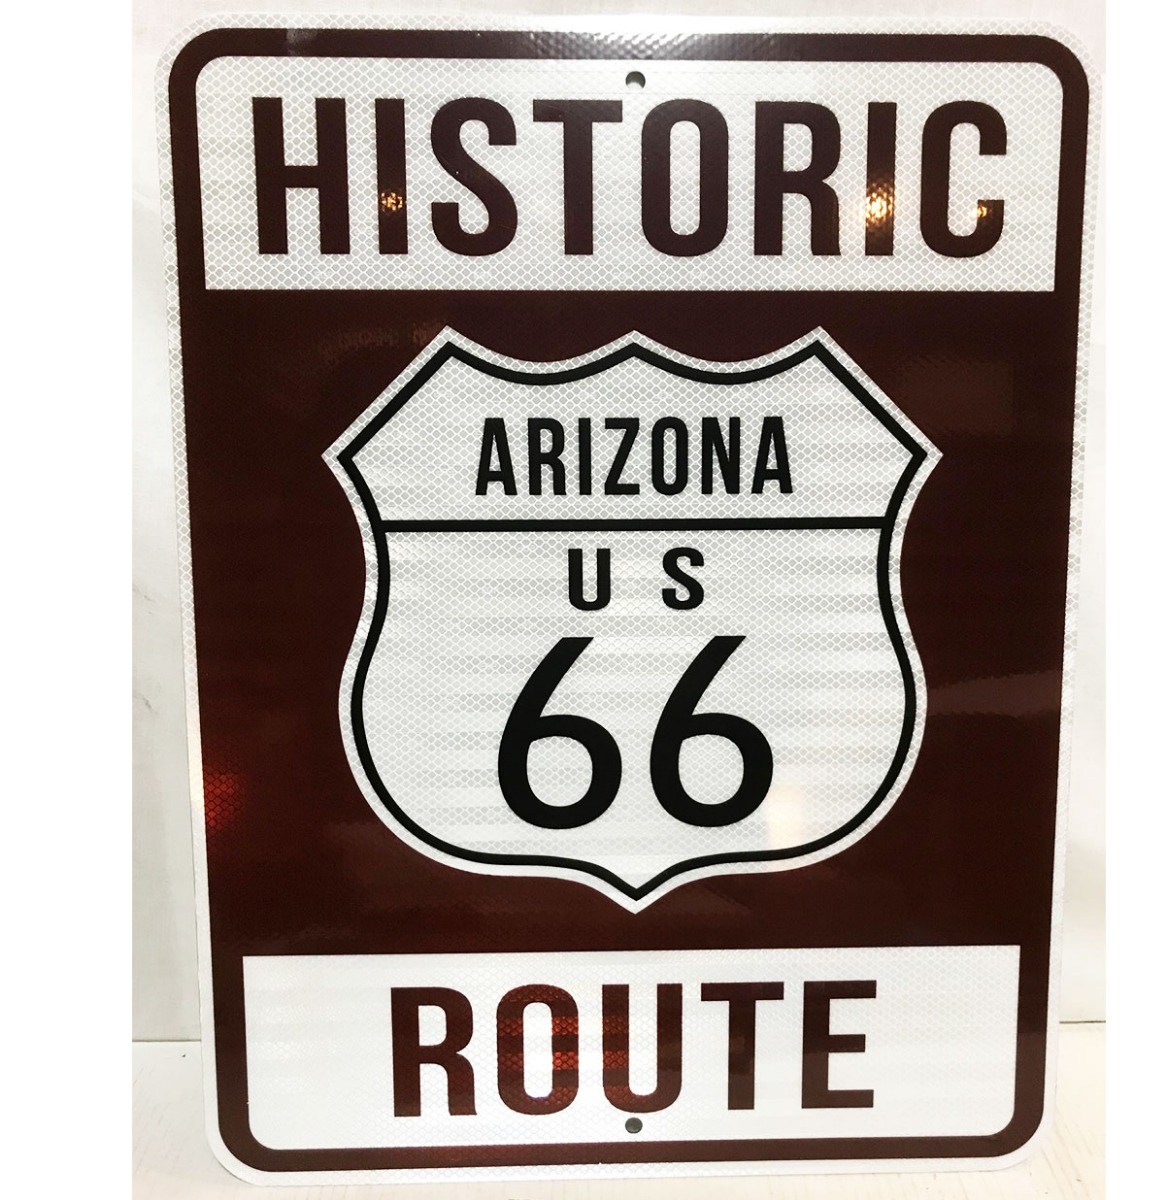 Historic Route 66 Arizona Snelweg Bord - Reflecterend